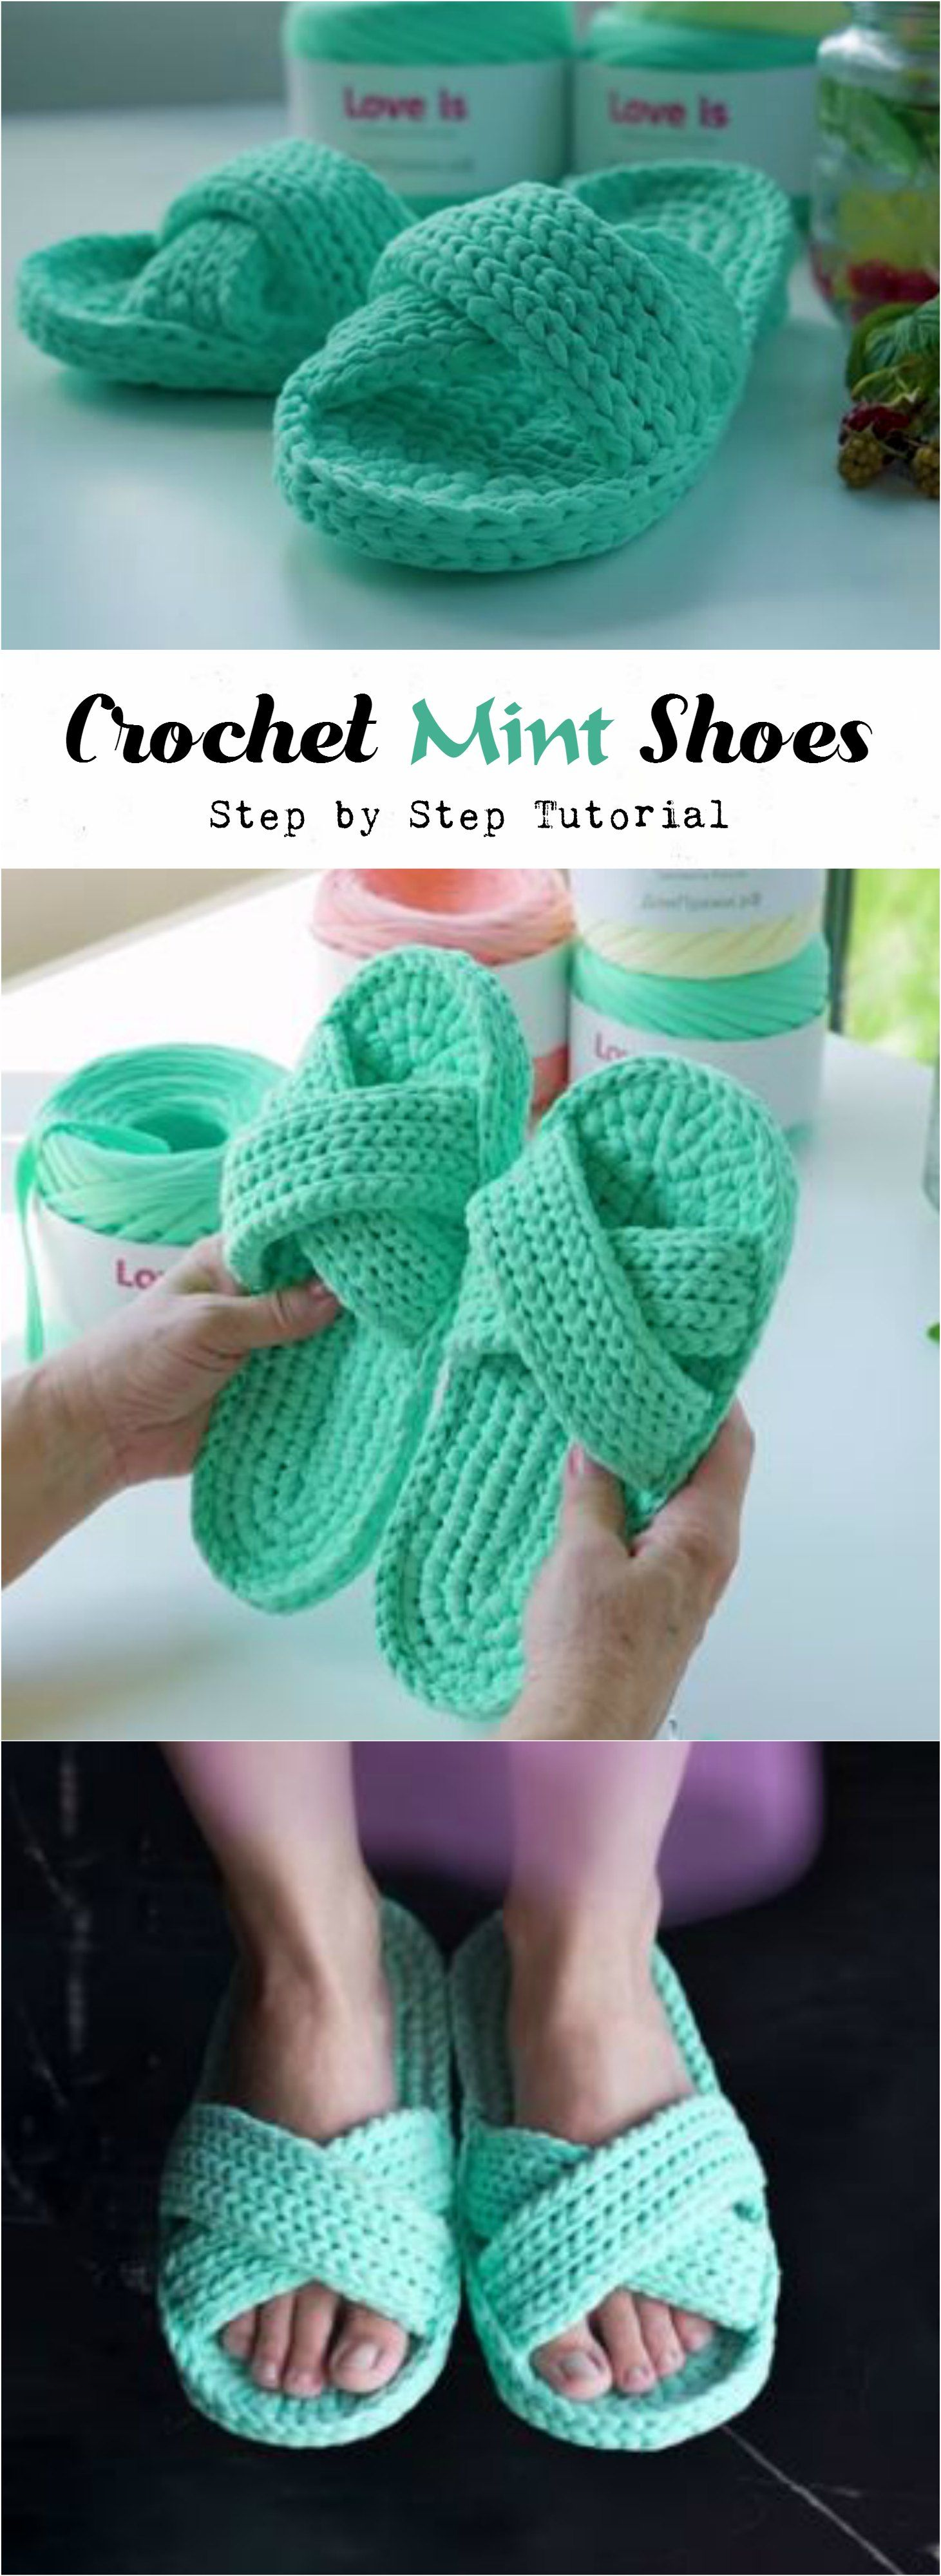 Crochet Mint Shoes | Chinelas, Color menta y Tejido